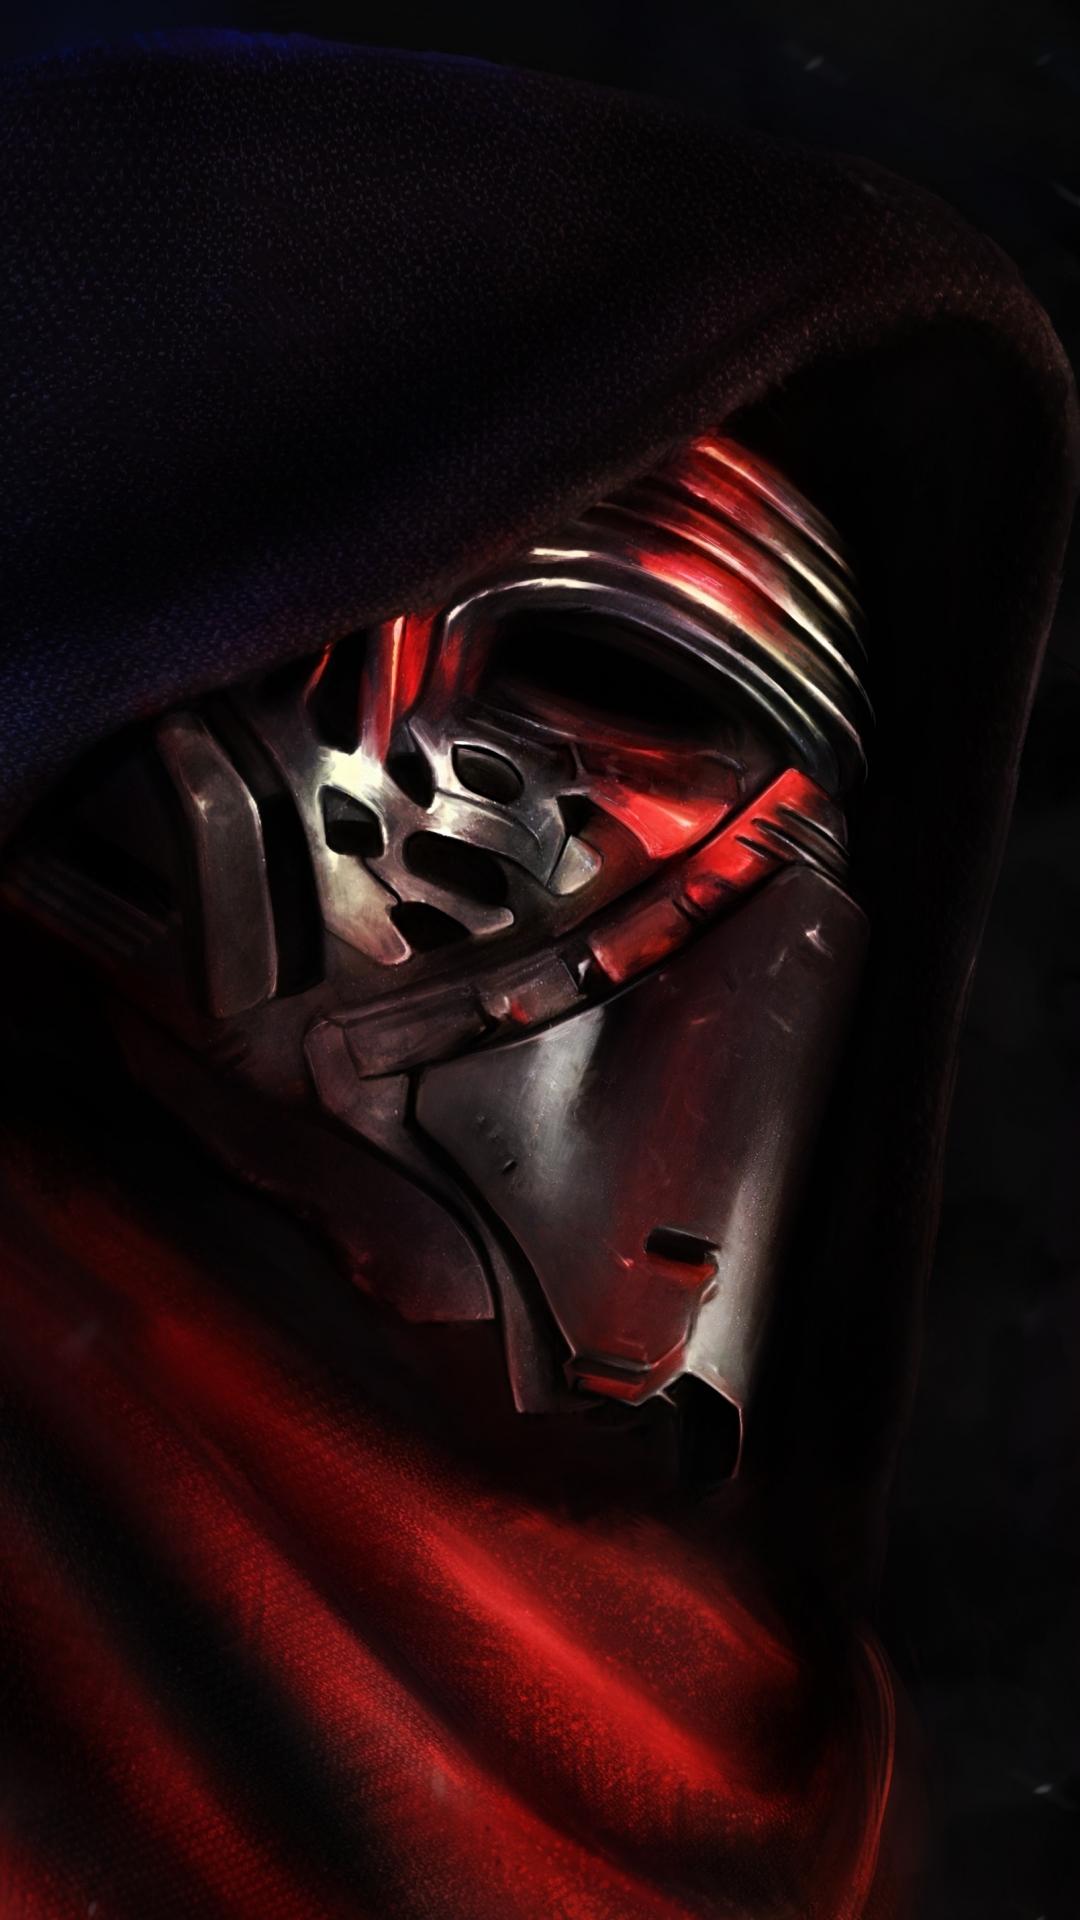 Cmo instalar los wallpapers de Star Wars The Force Awakens en 1080x1920